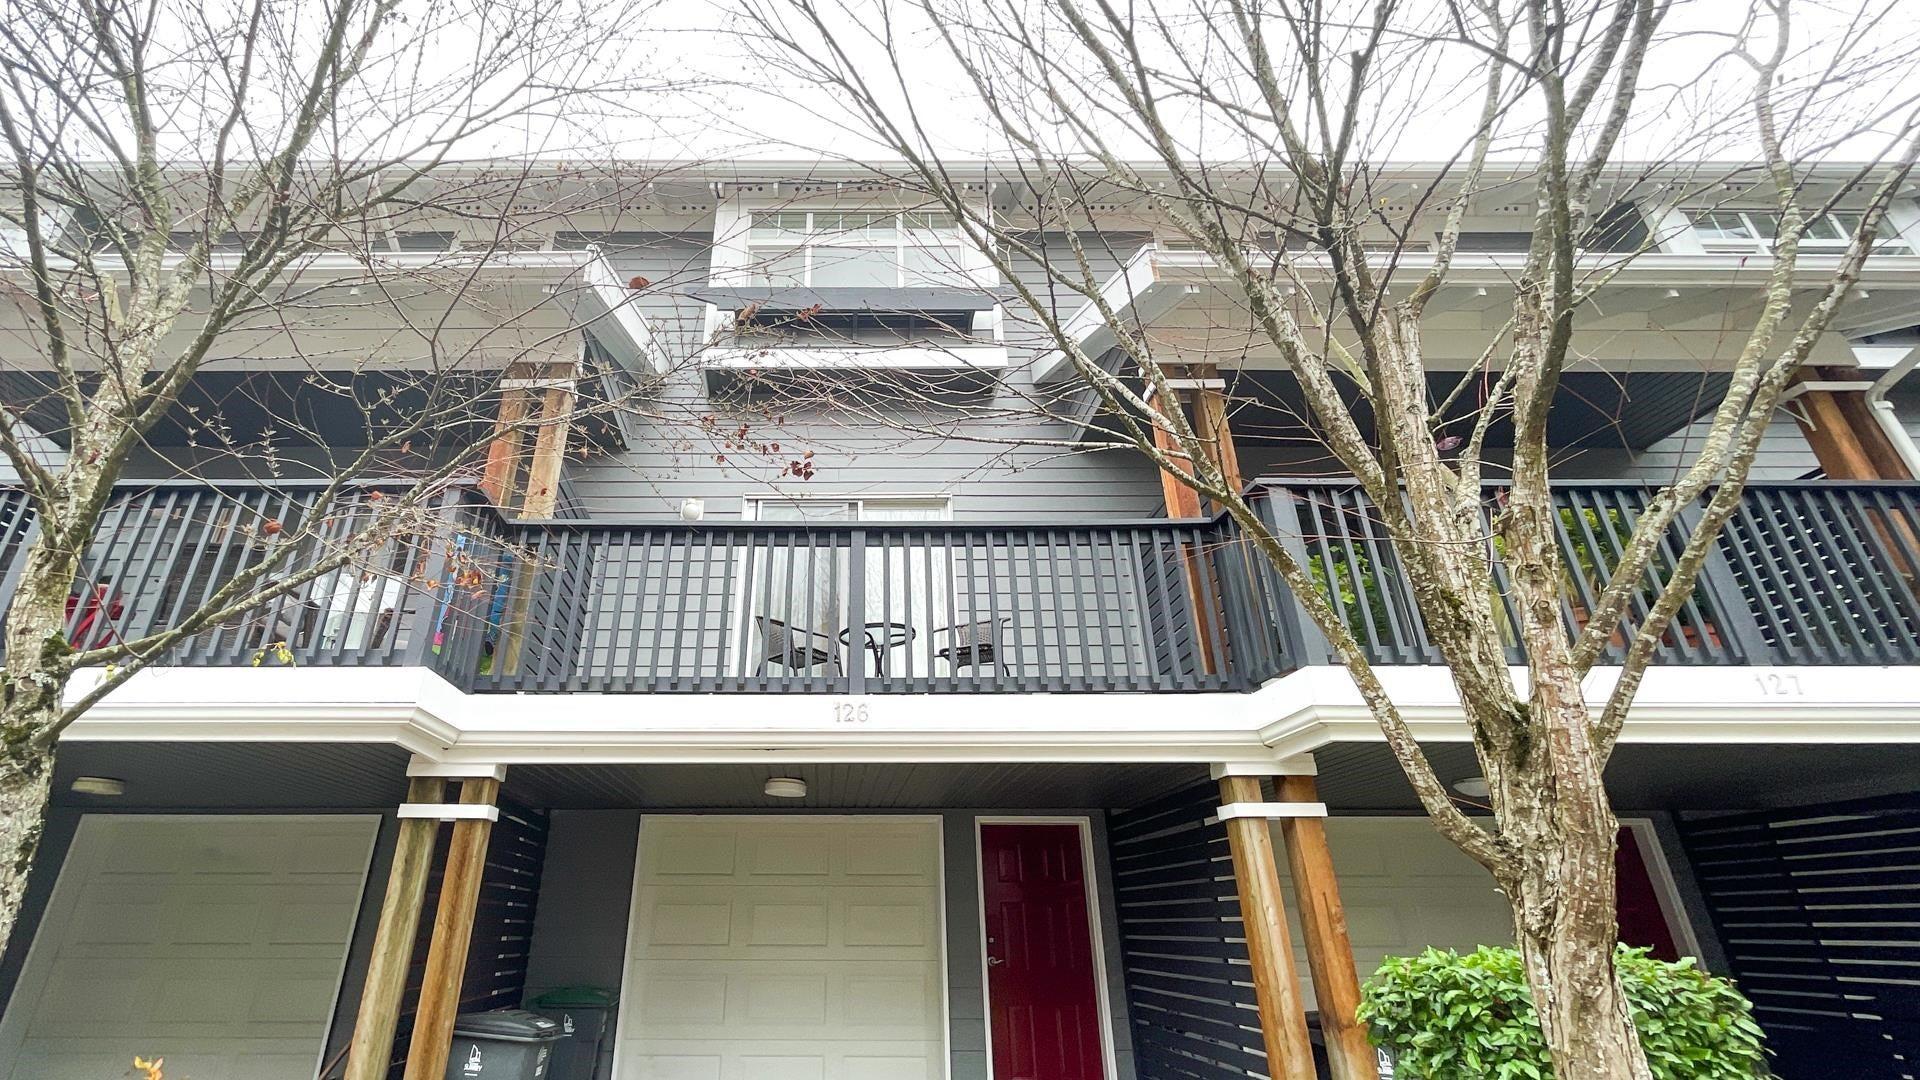 126 15236 36 AVENUE - Morgan Creek Townhouse for sale, 2 Bedrooms (R2628538)